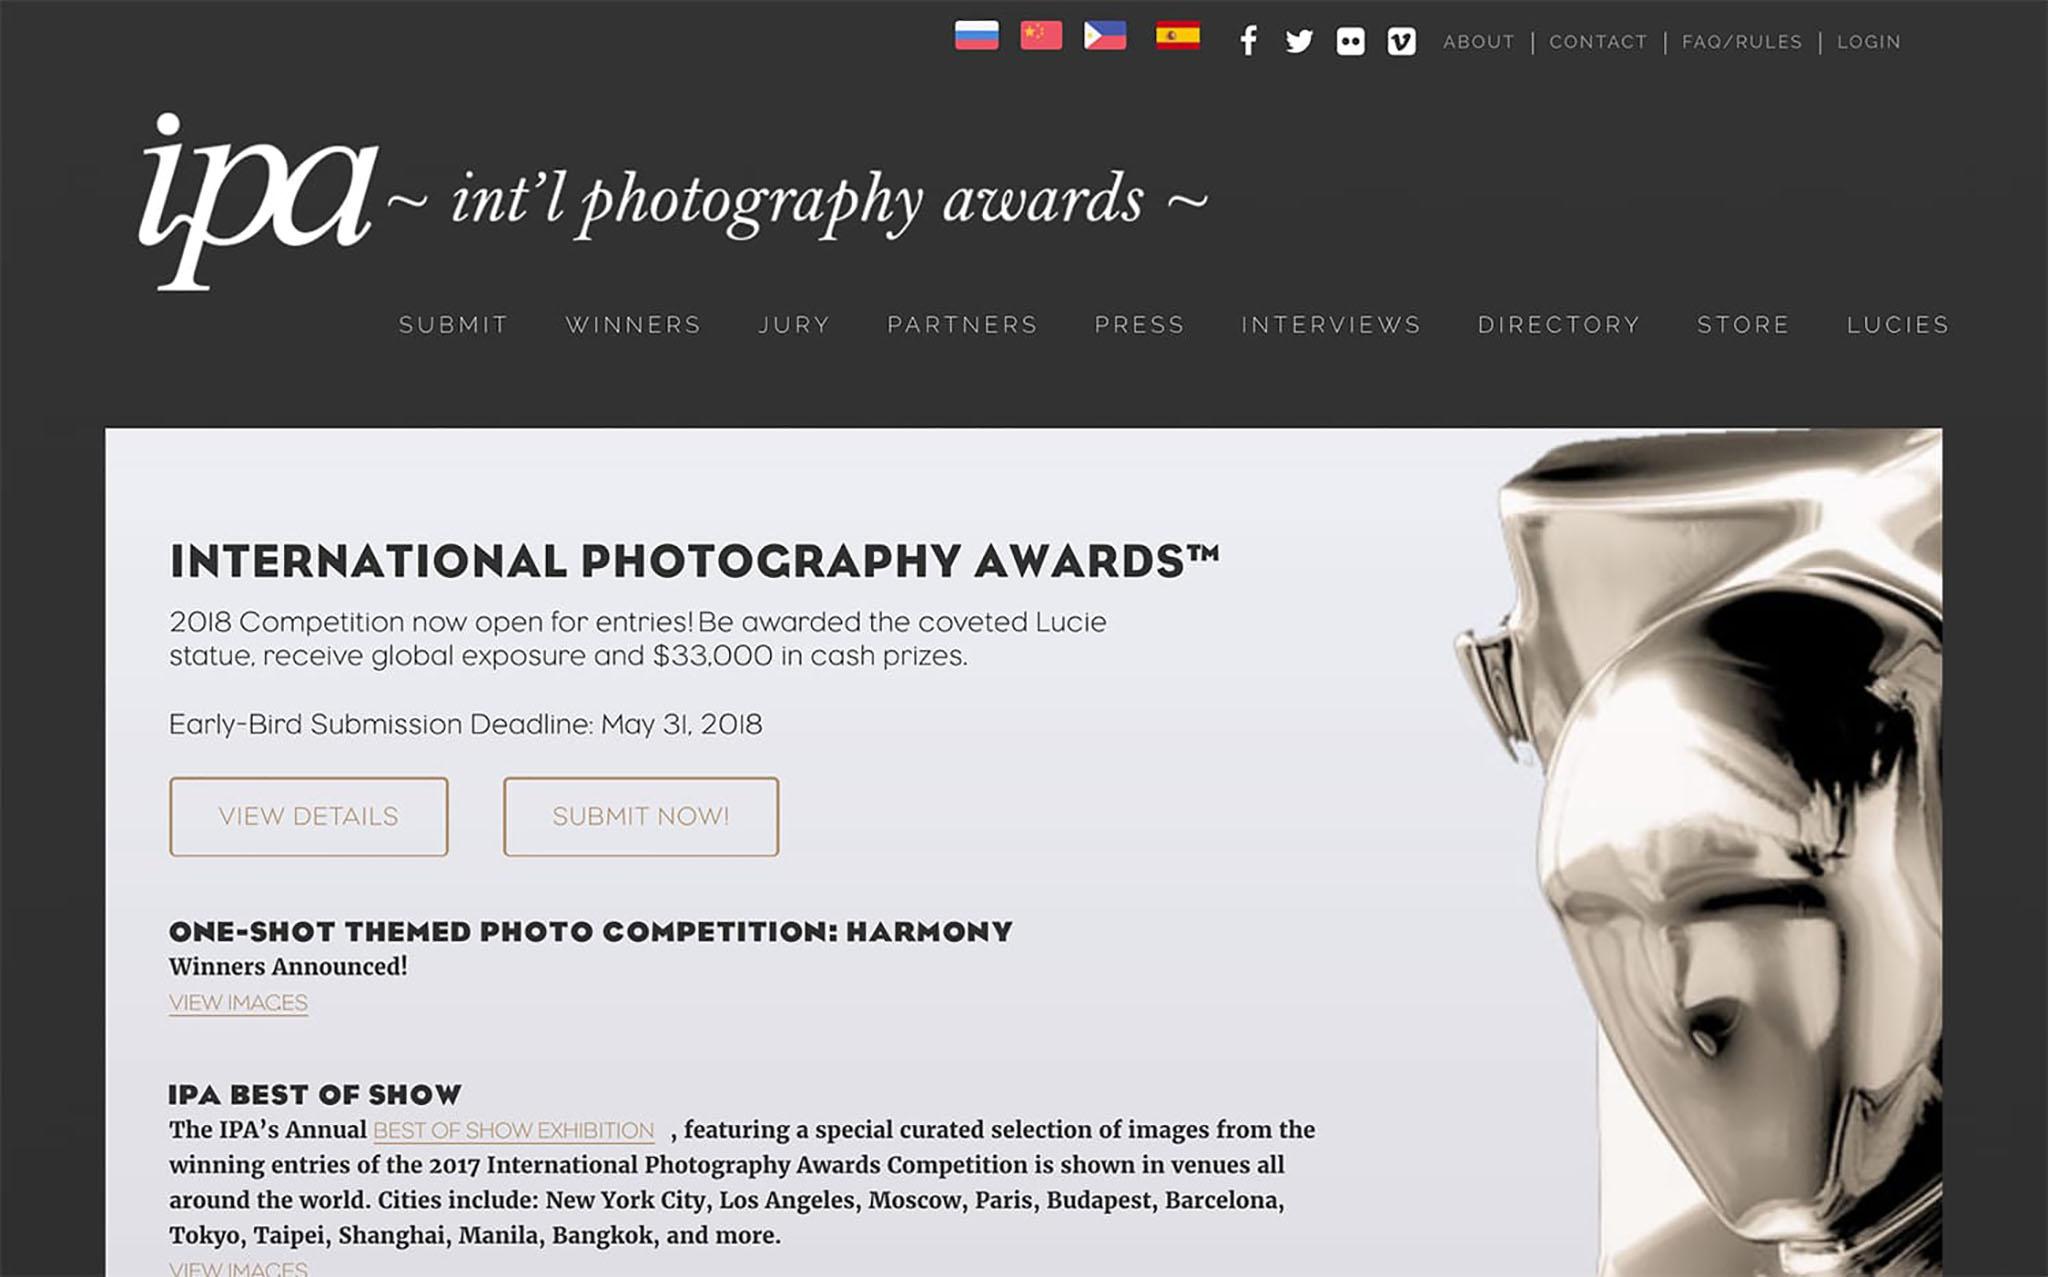 awards-ipa.jpg